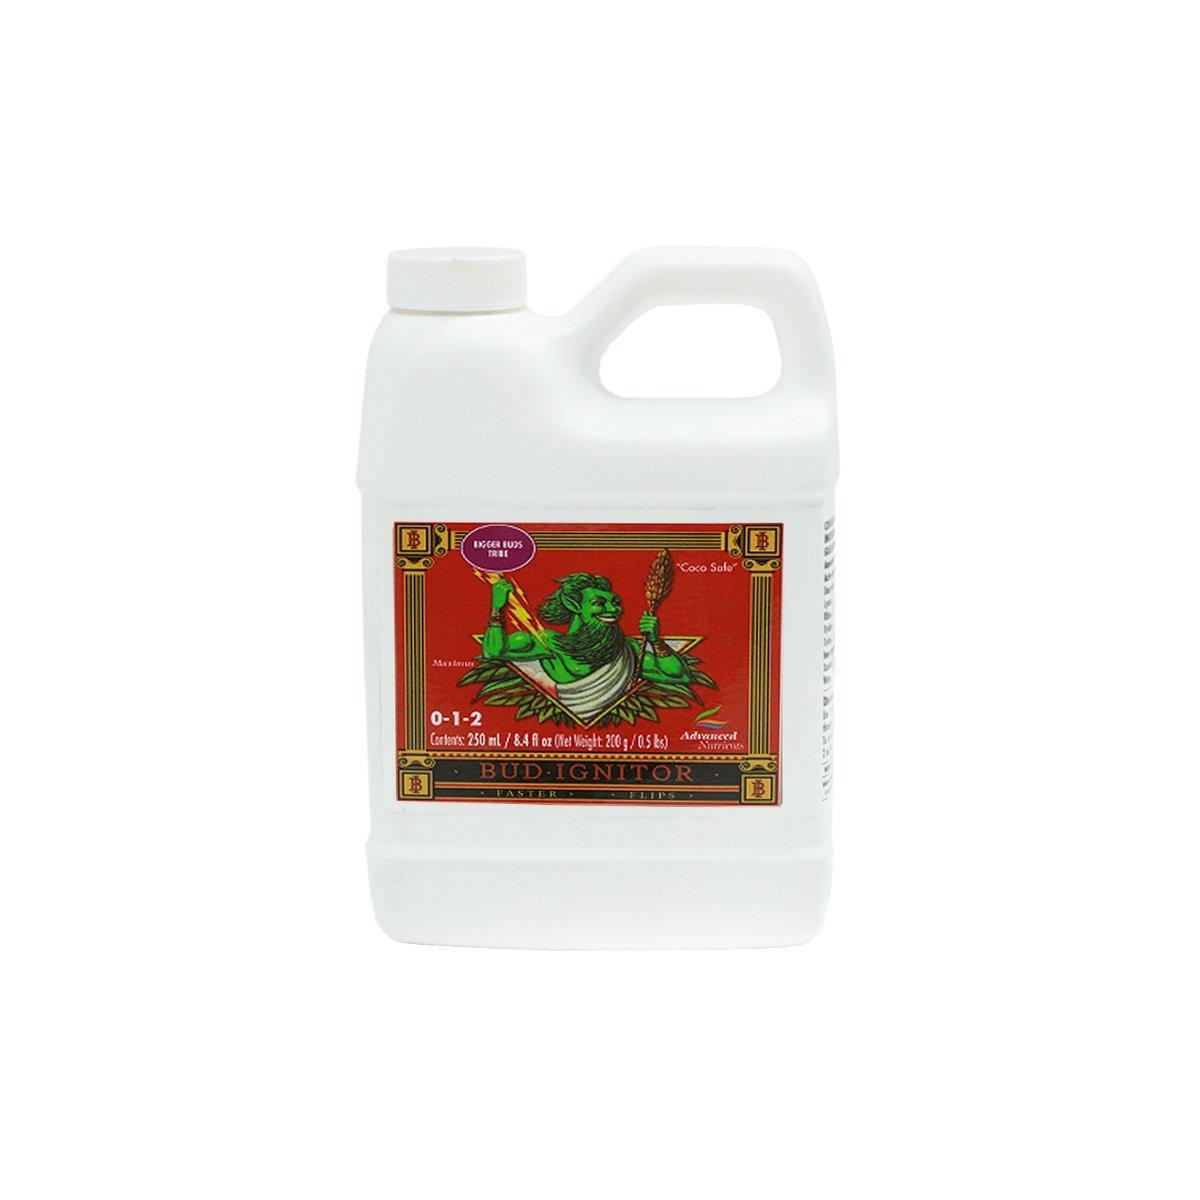 Advanced Nutrients Bud Ignitor Fertilizer, 250ml iPower Distributor L&G 2360-12